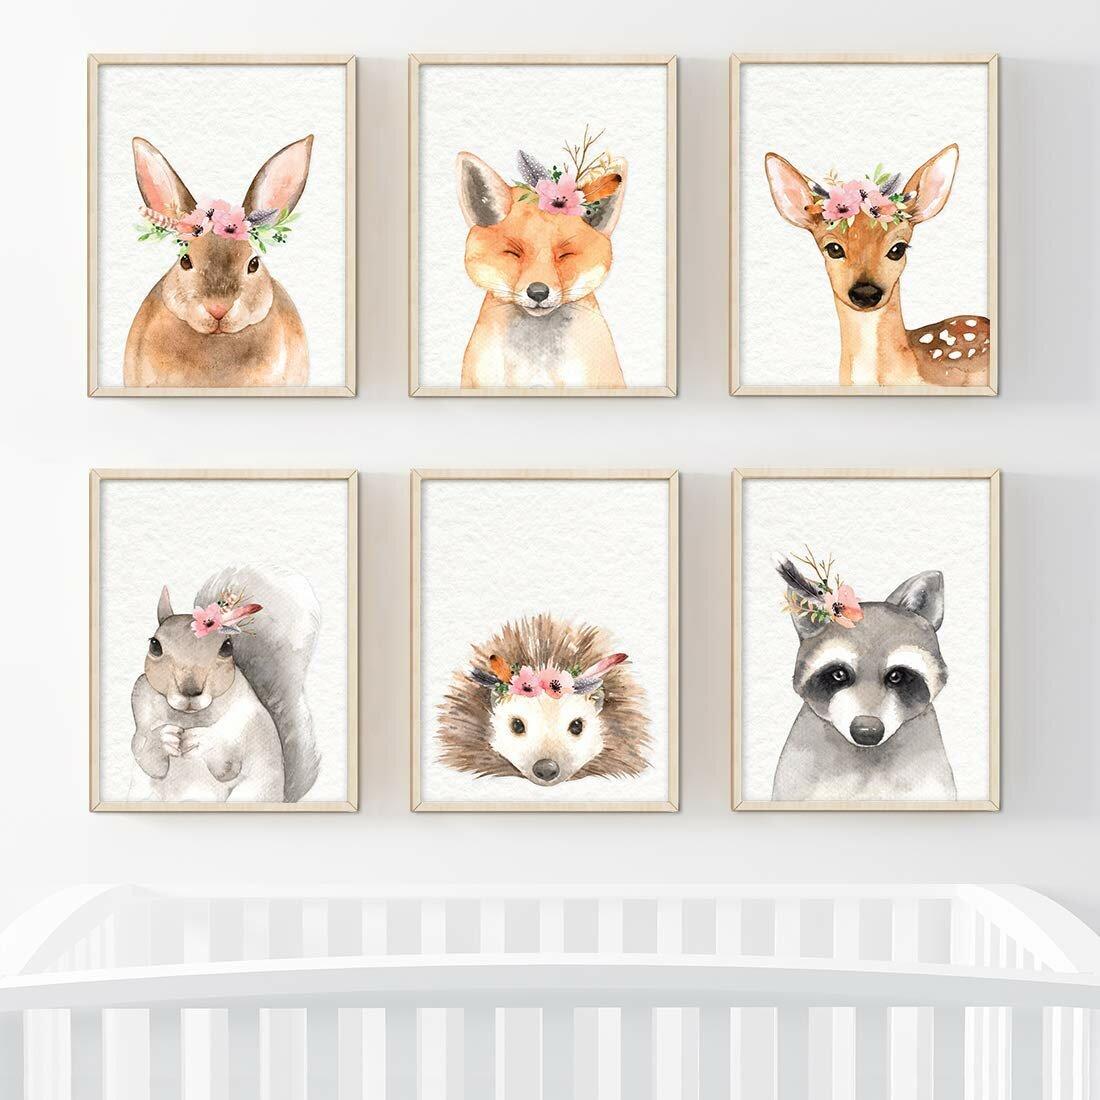 6-Piece Set of Forest Animals Prints